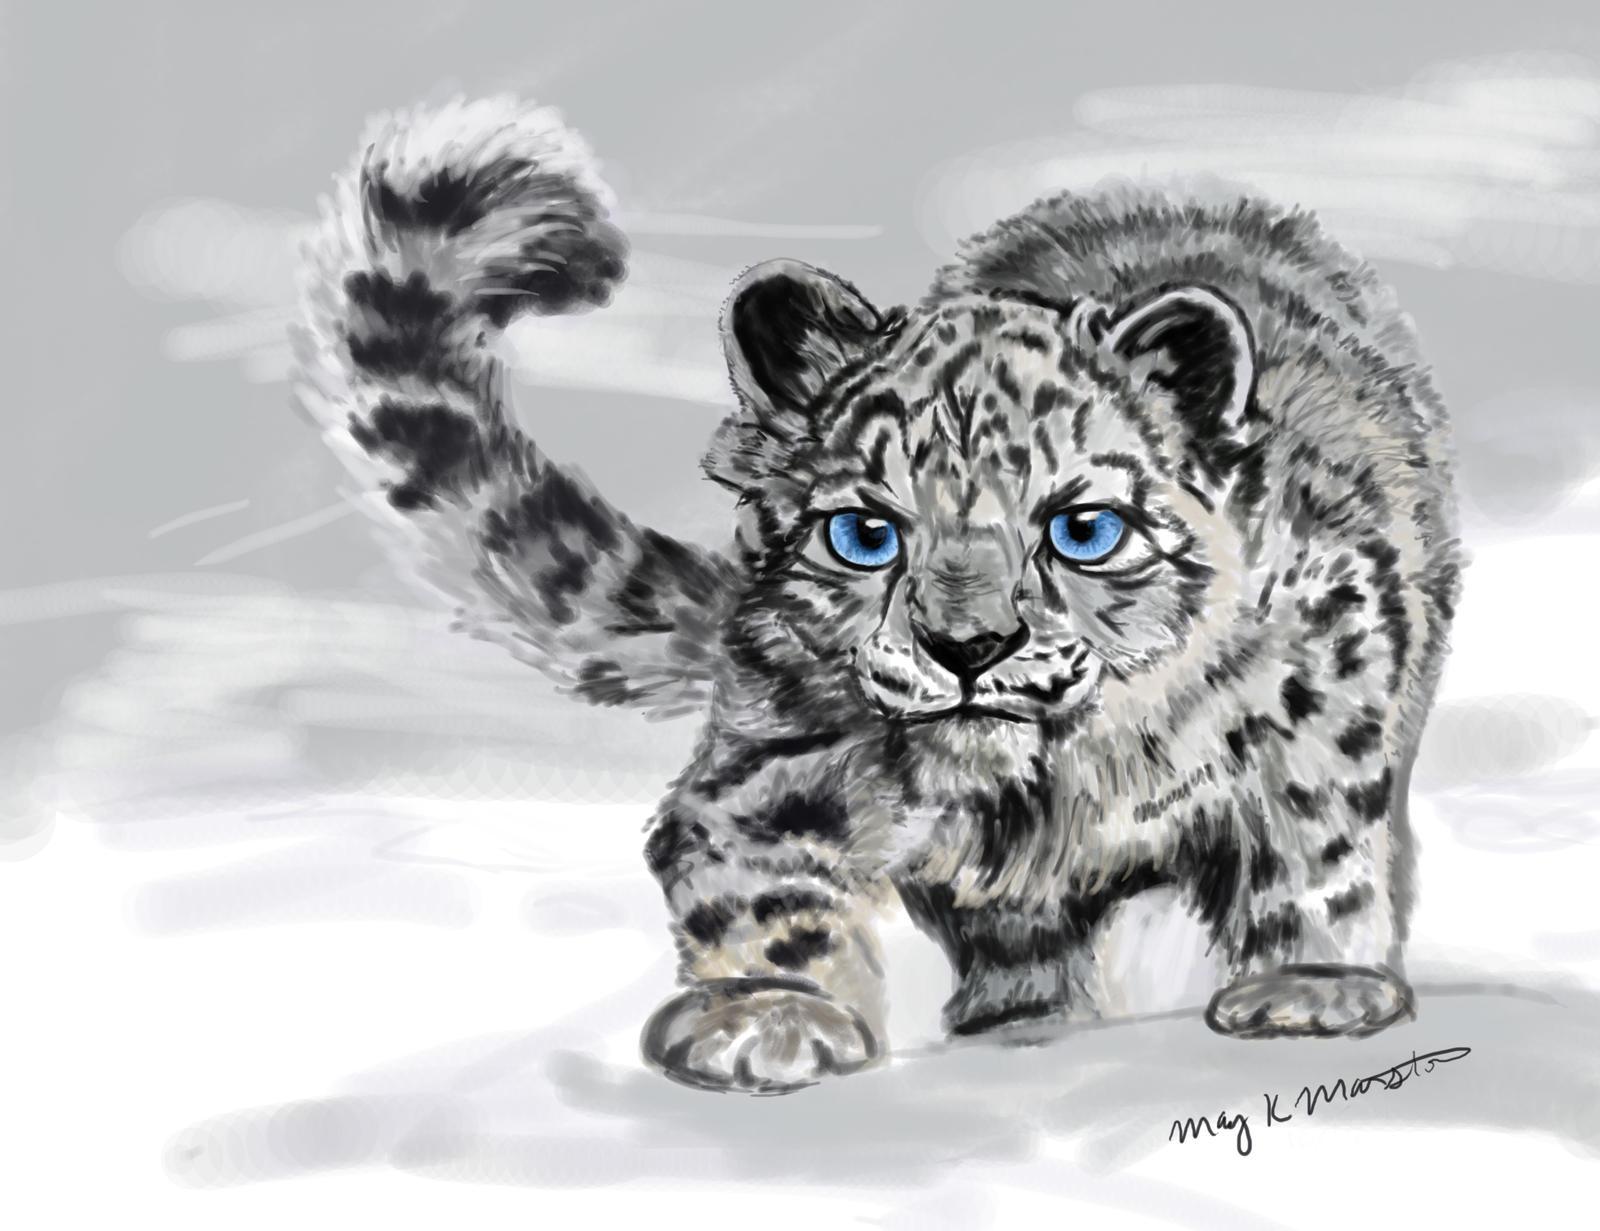 Snowshoe The Snow Leopard By Mkmars On DeviantArt